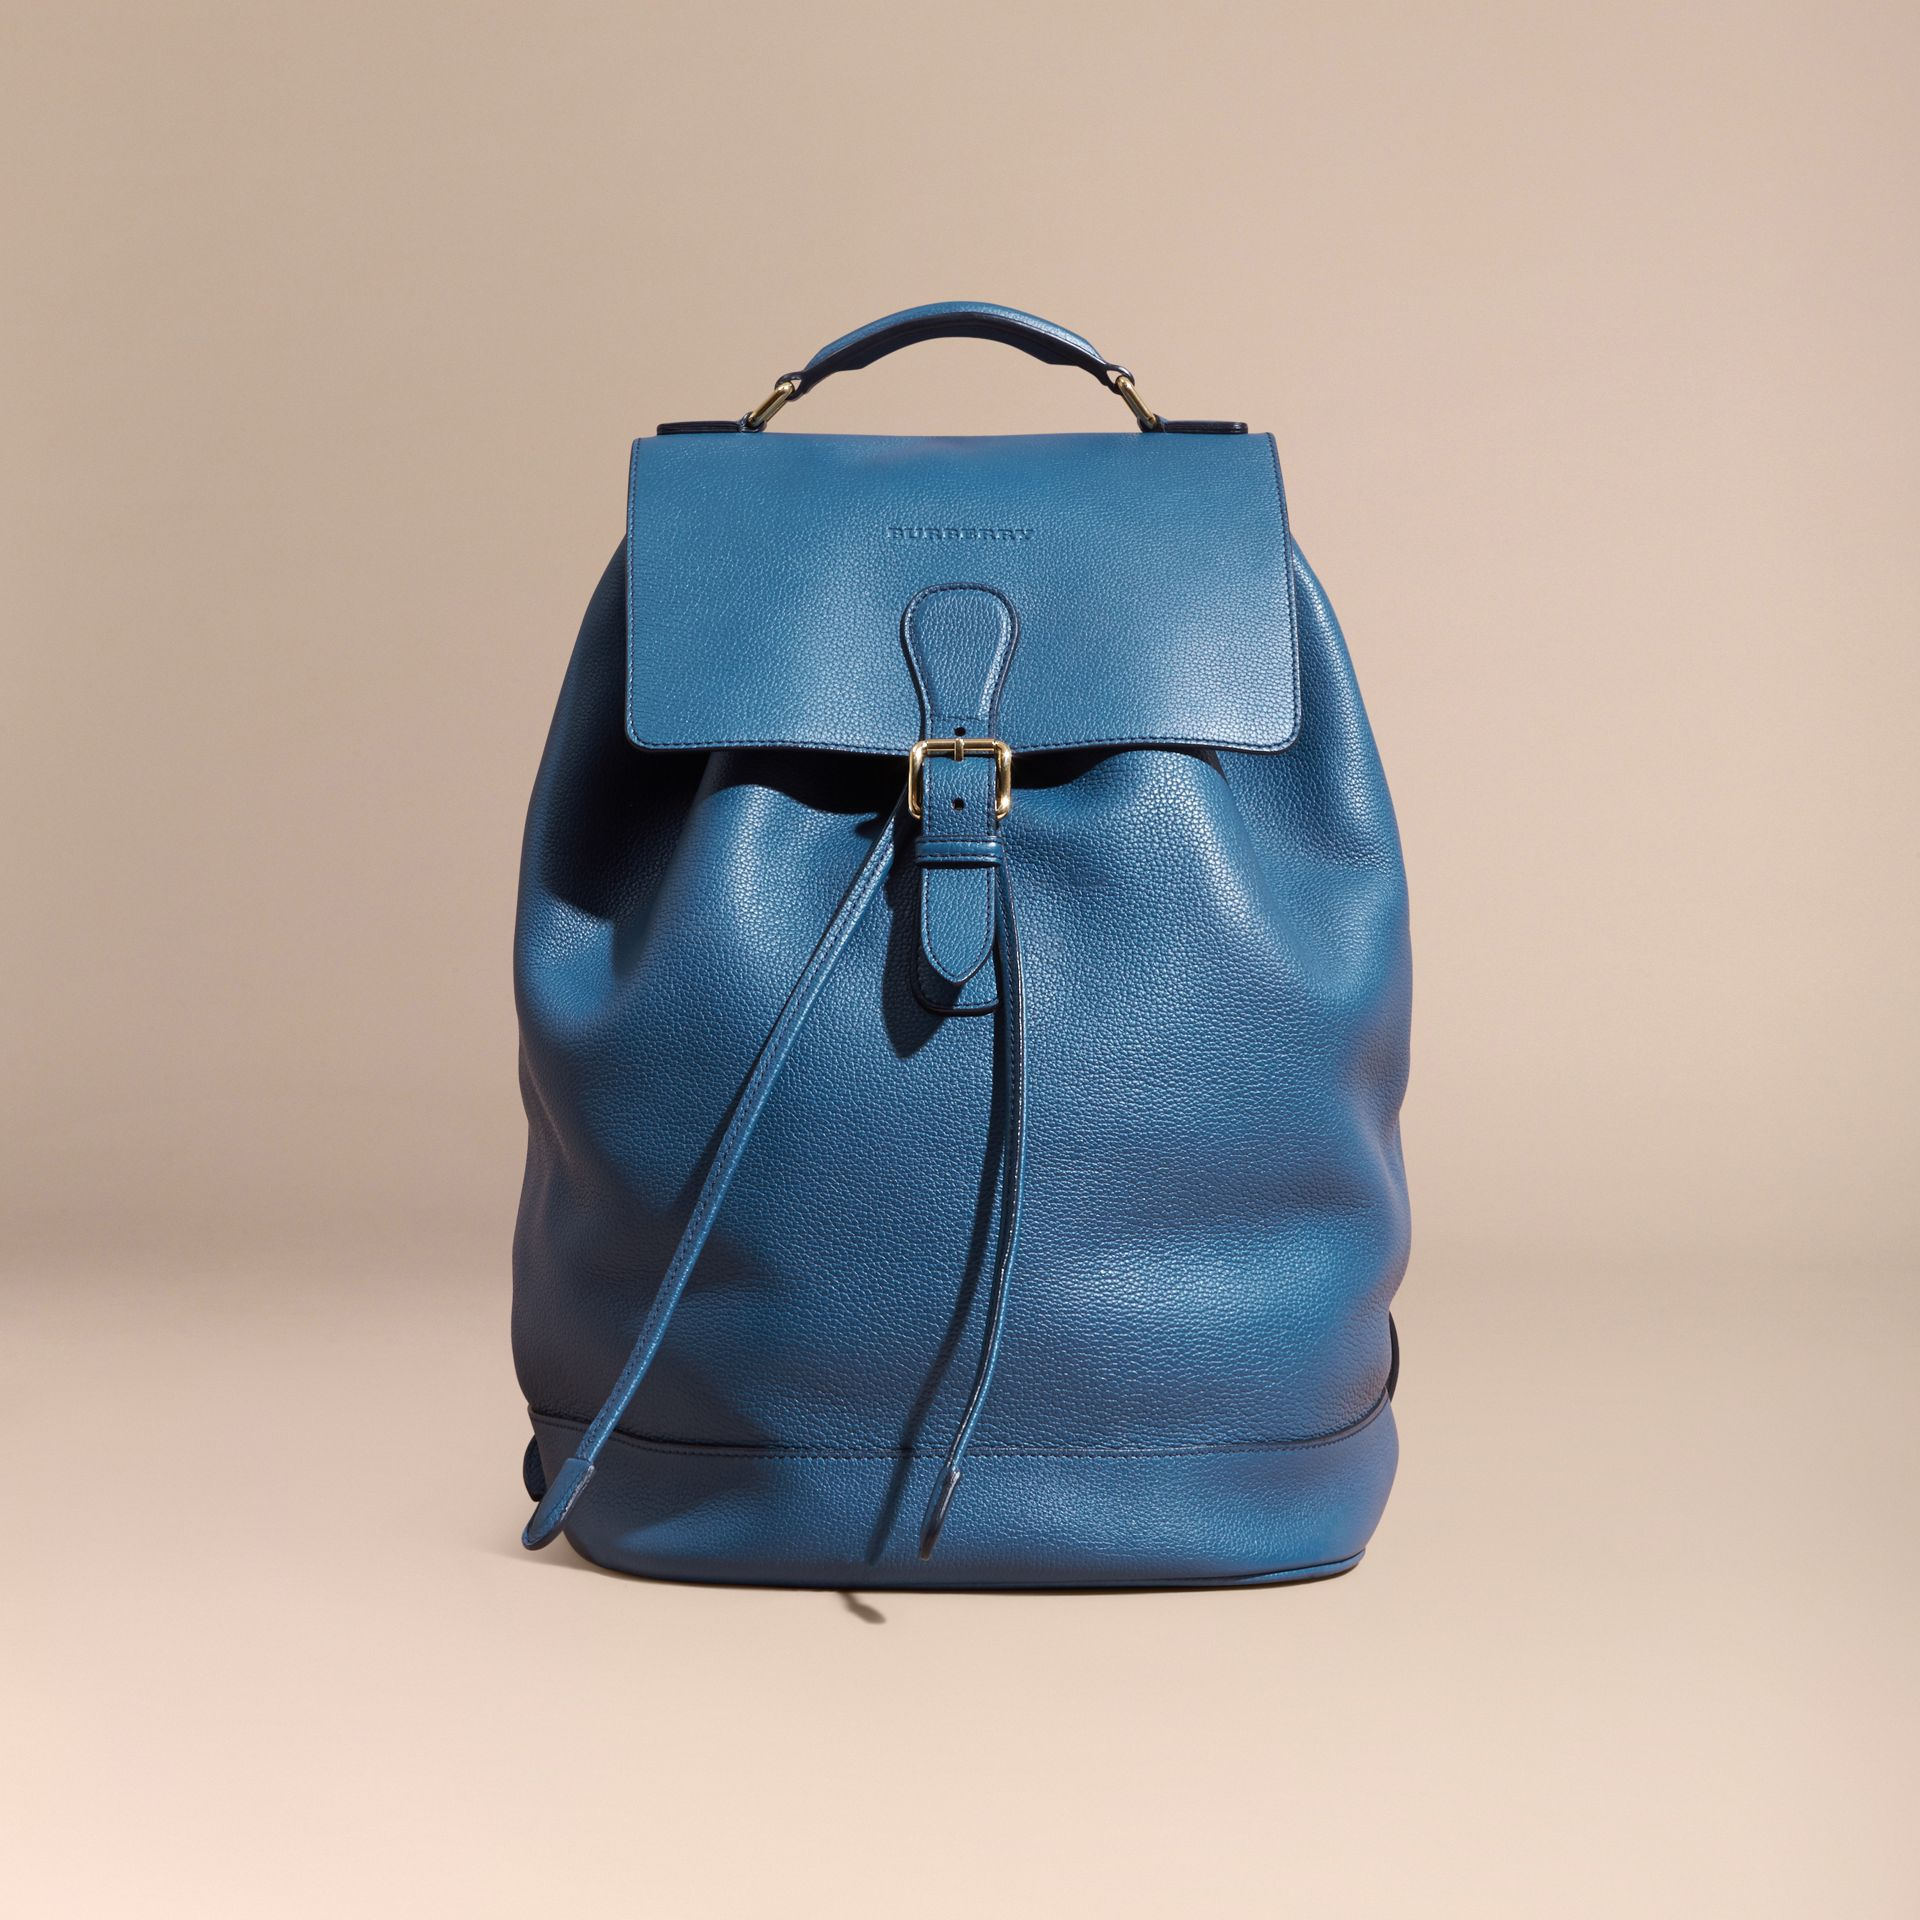 Mineral blue Mochila de couro granulado Mineral Blue - galeria de imagens 9